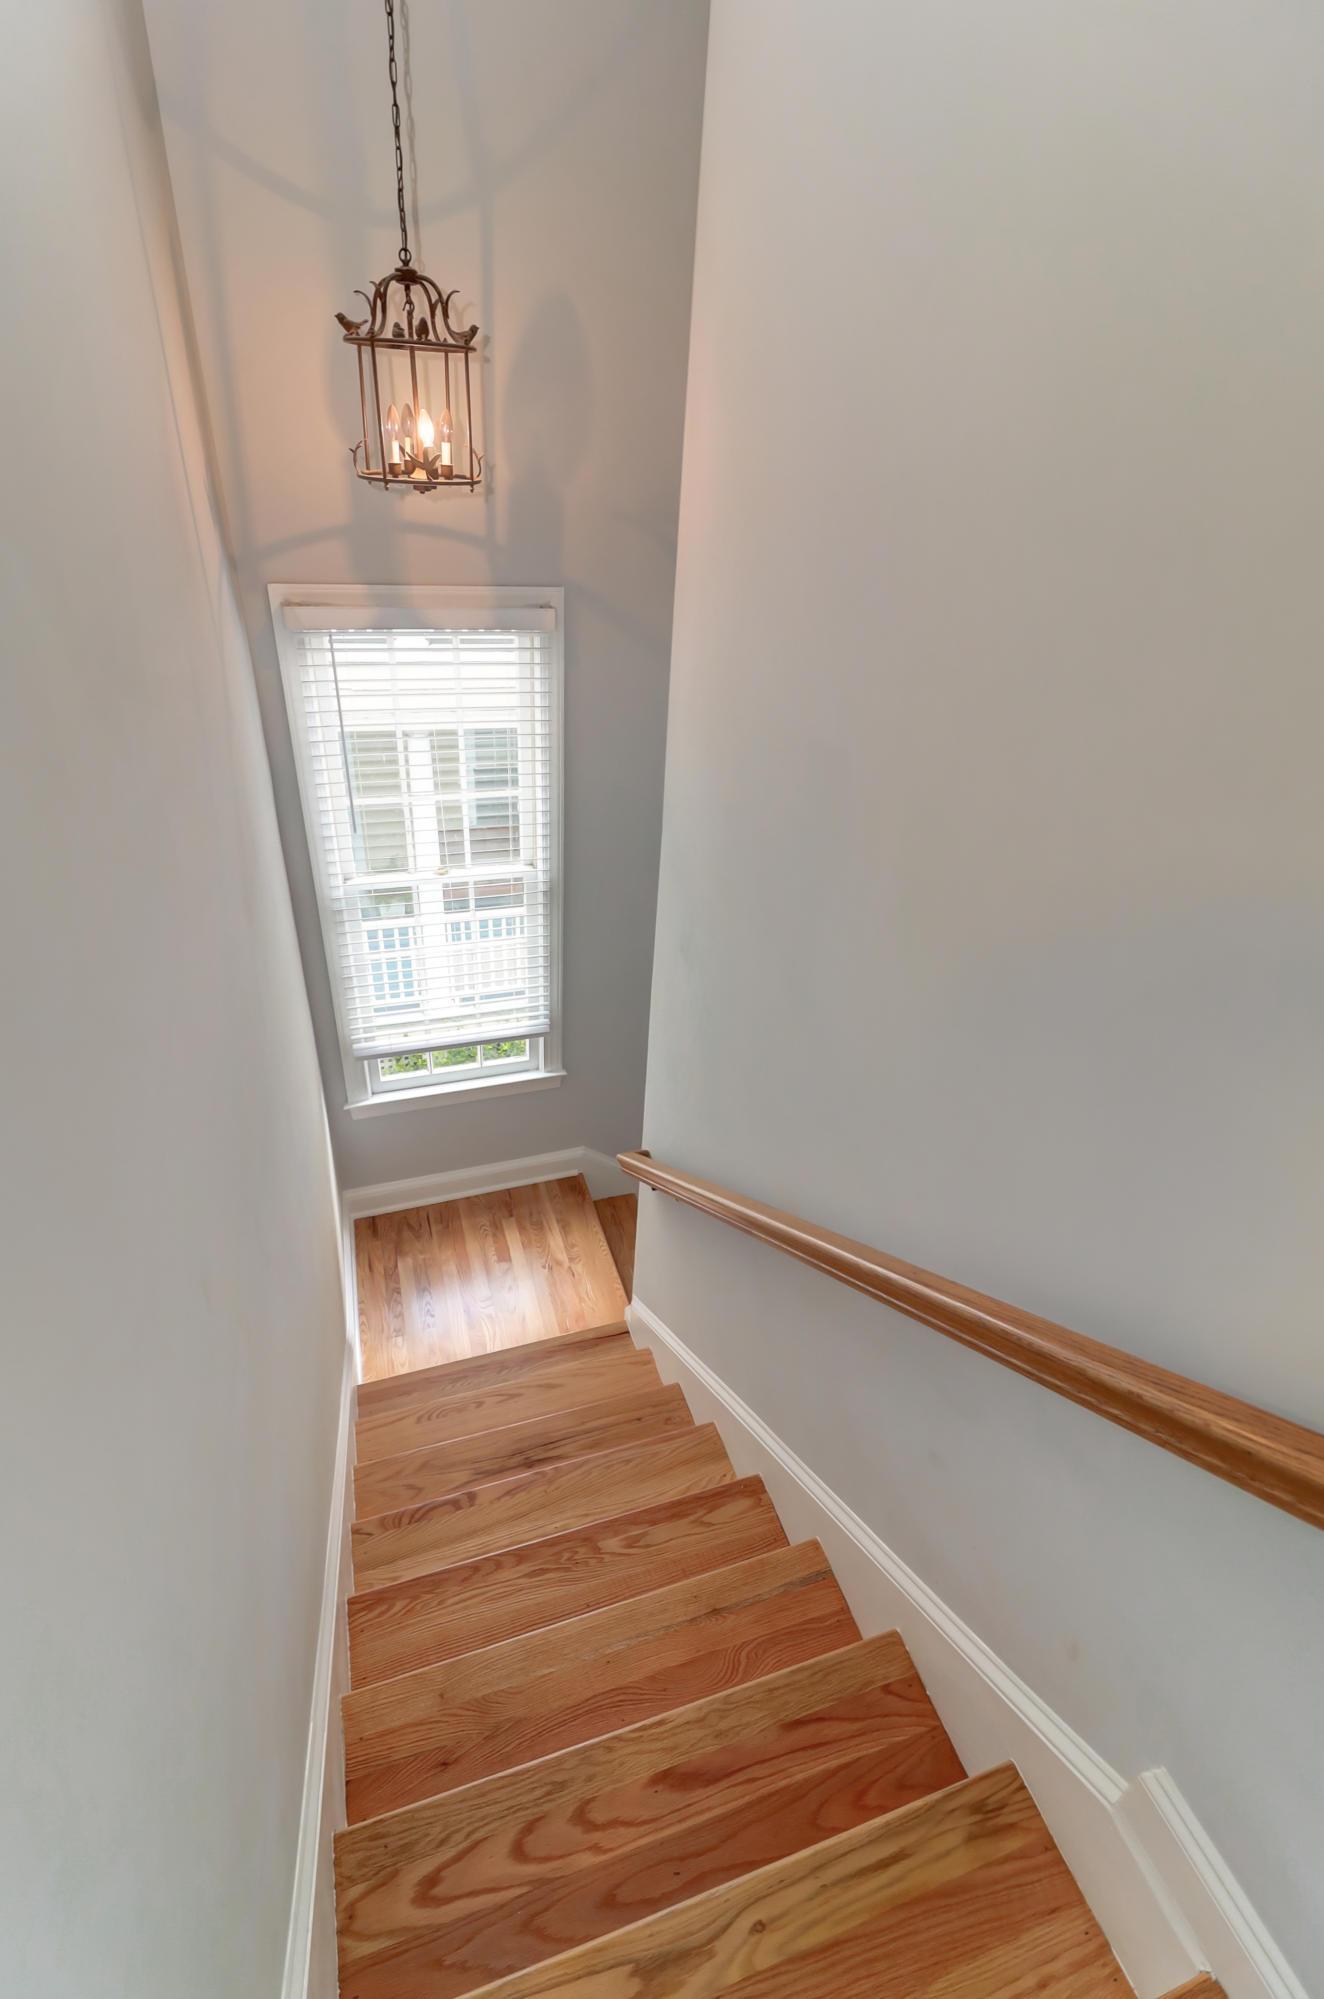 Radcliffeborough Homes For Sale - 5 Radcliffe, Charleston, SC - 23